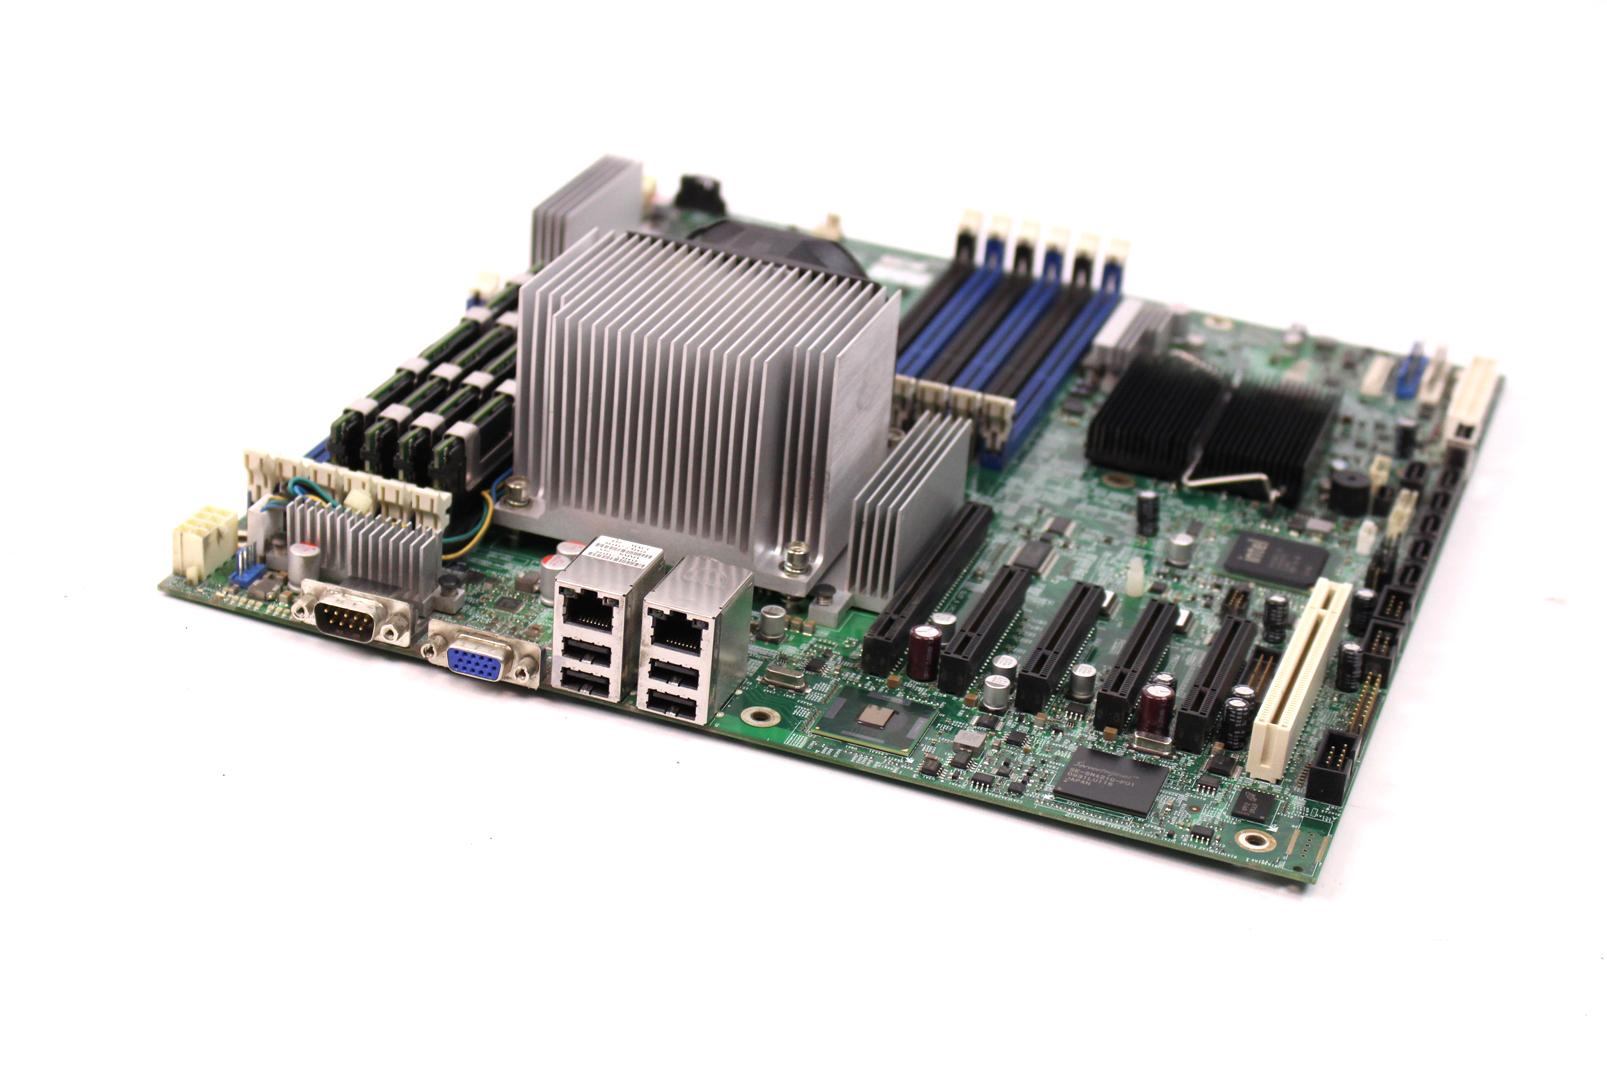 intel s5520hc server mainboard xeon e5520 2 ghz cpu 16 gb ram usb 2 0 2x lga1366 ebay. Black Bedroom Furniture Sets. Home Design Ideas